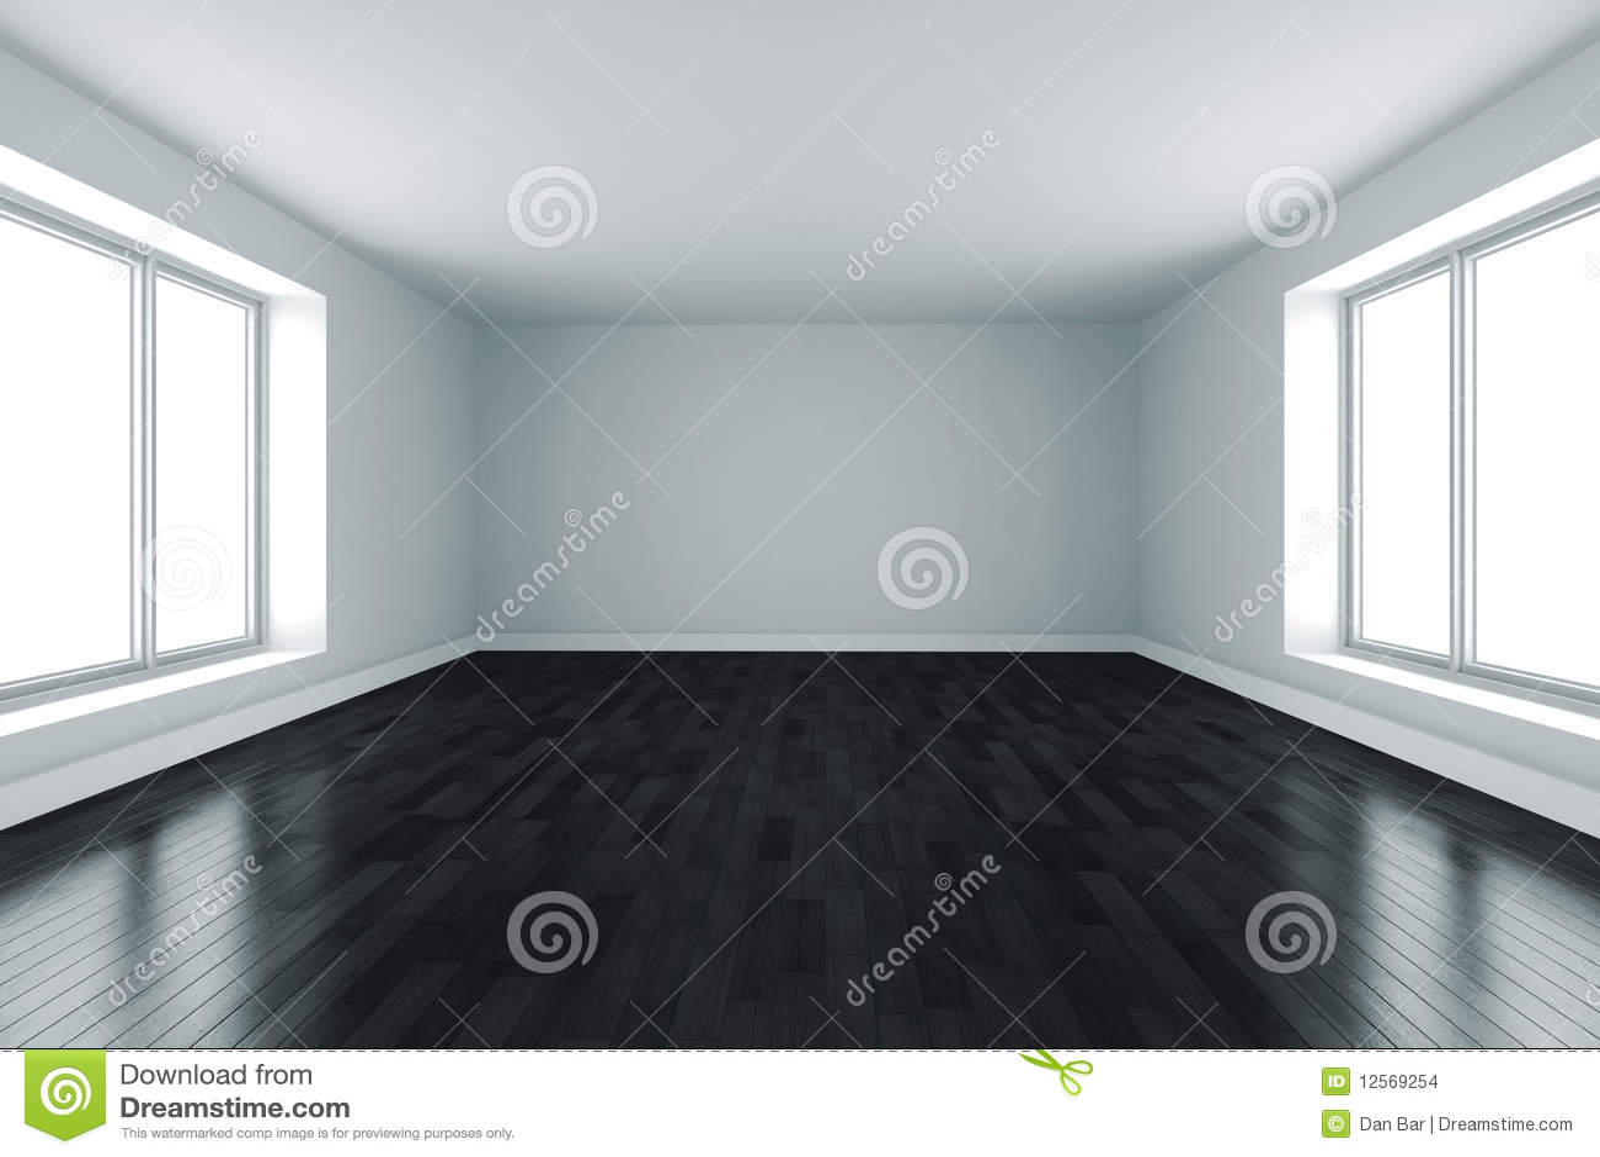 Witte Keuken Met Zwarte Vloer : Black Floors with White Walls